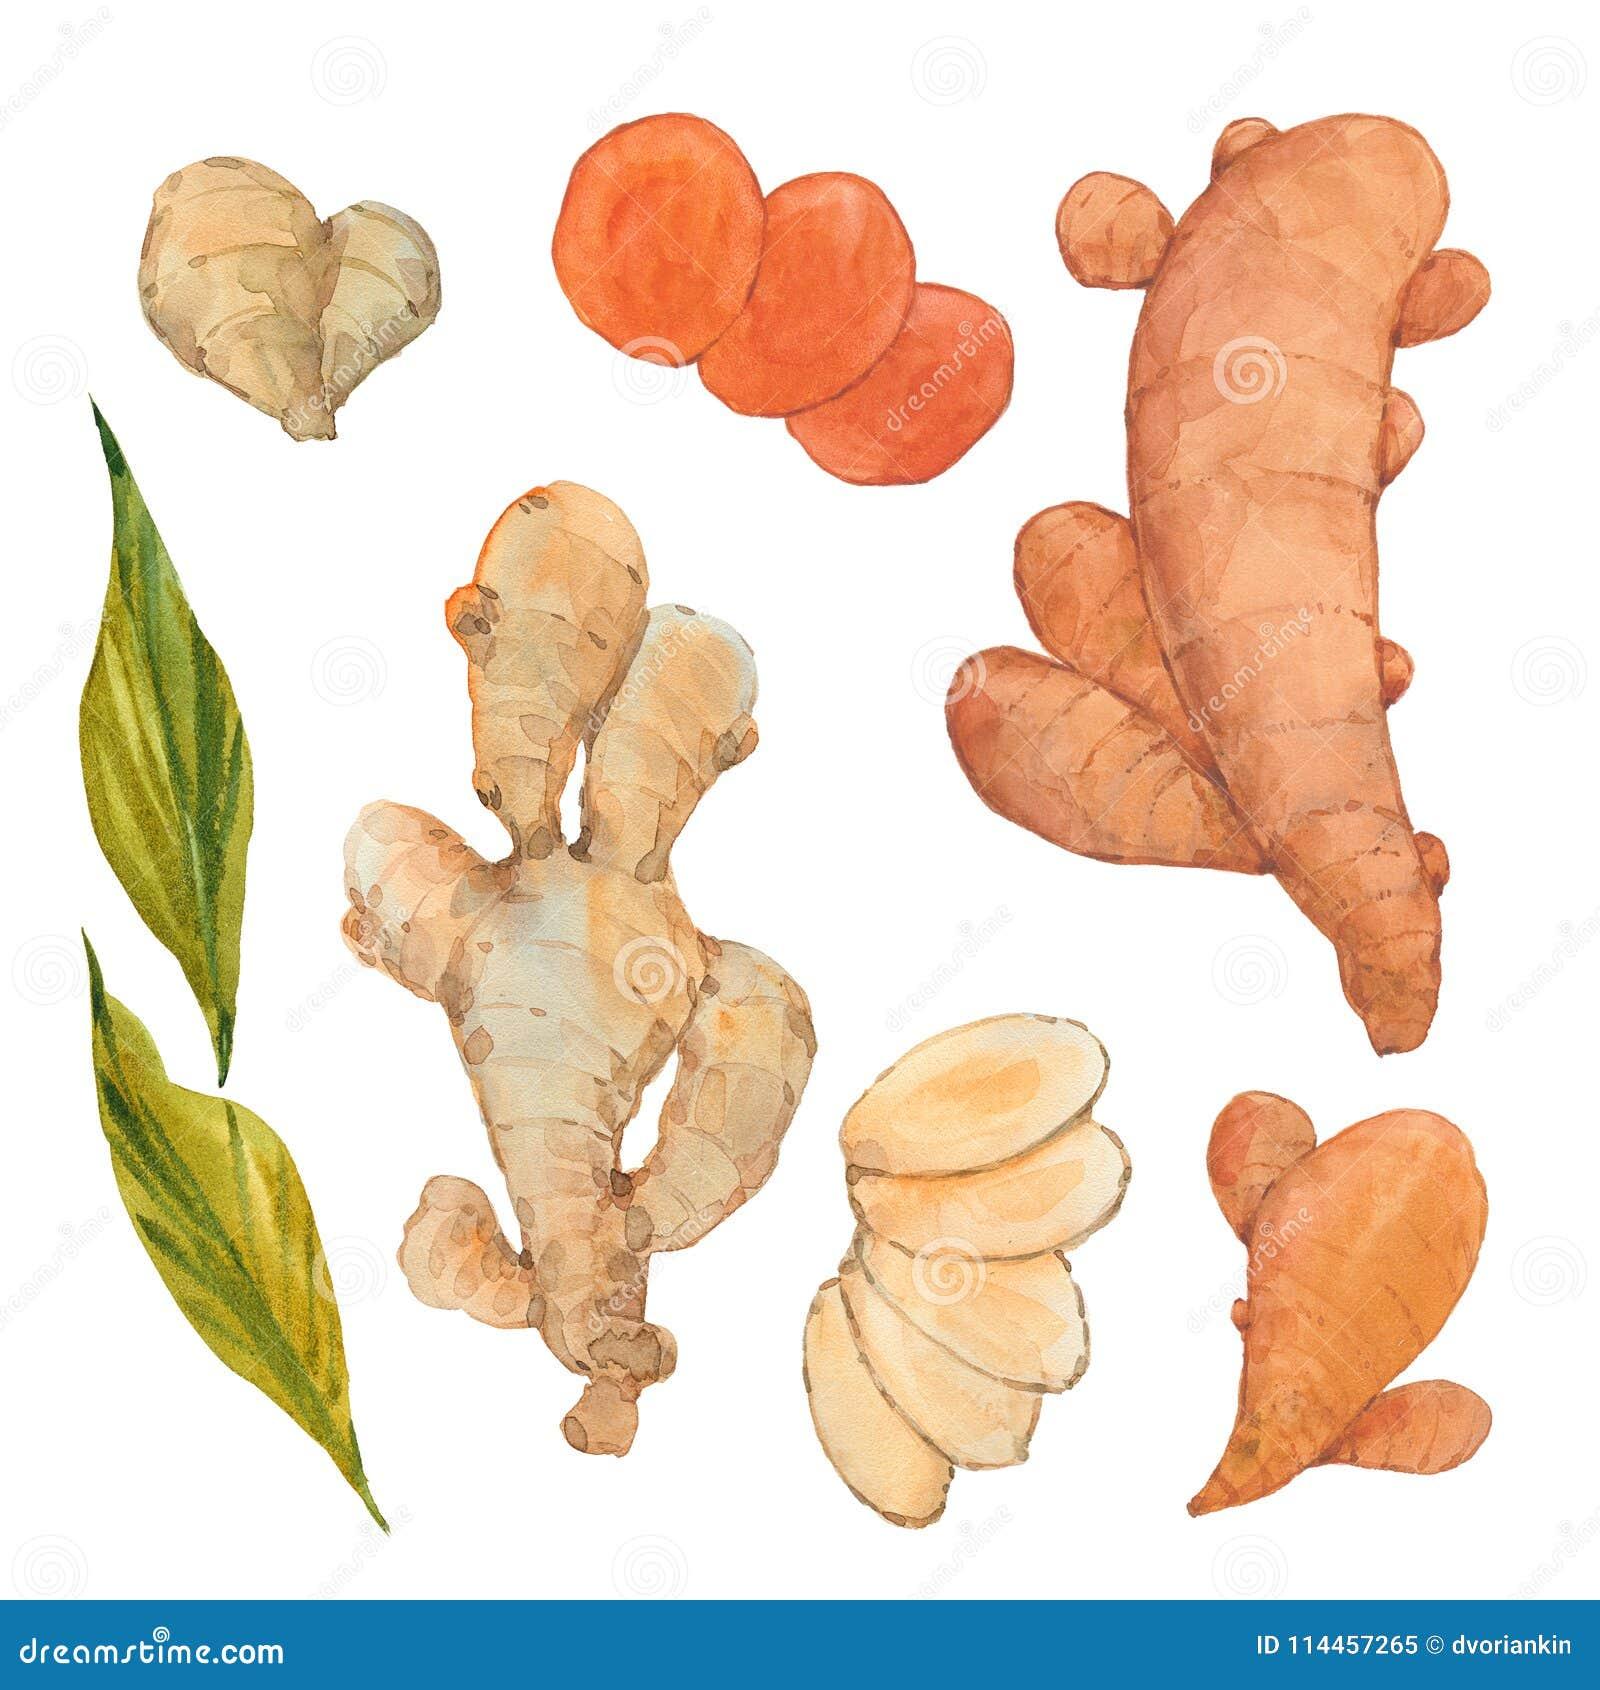 Ginger and turmeric stock illustration  Illustration of